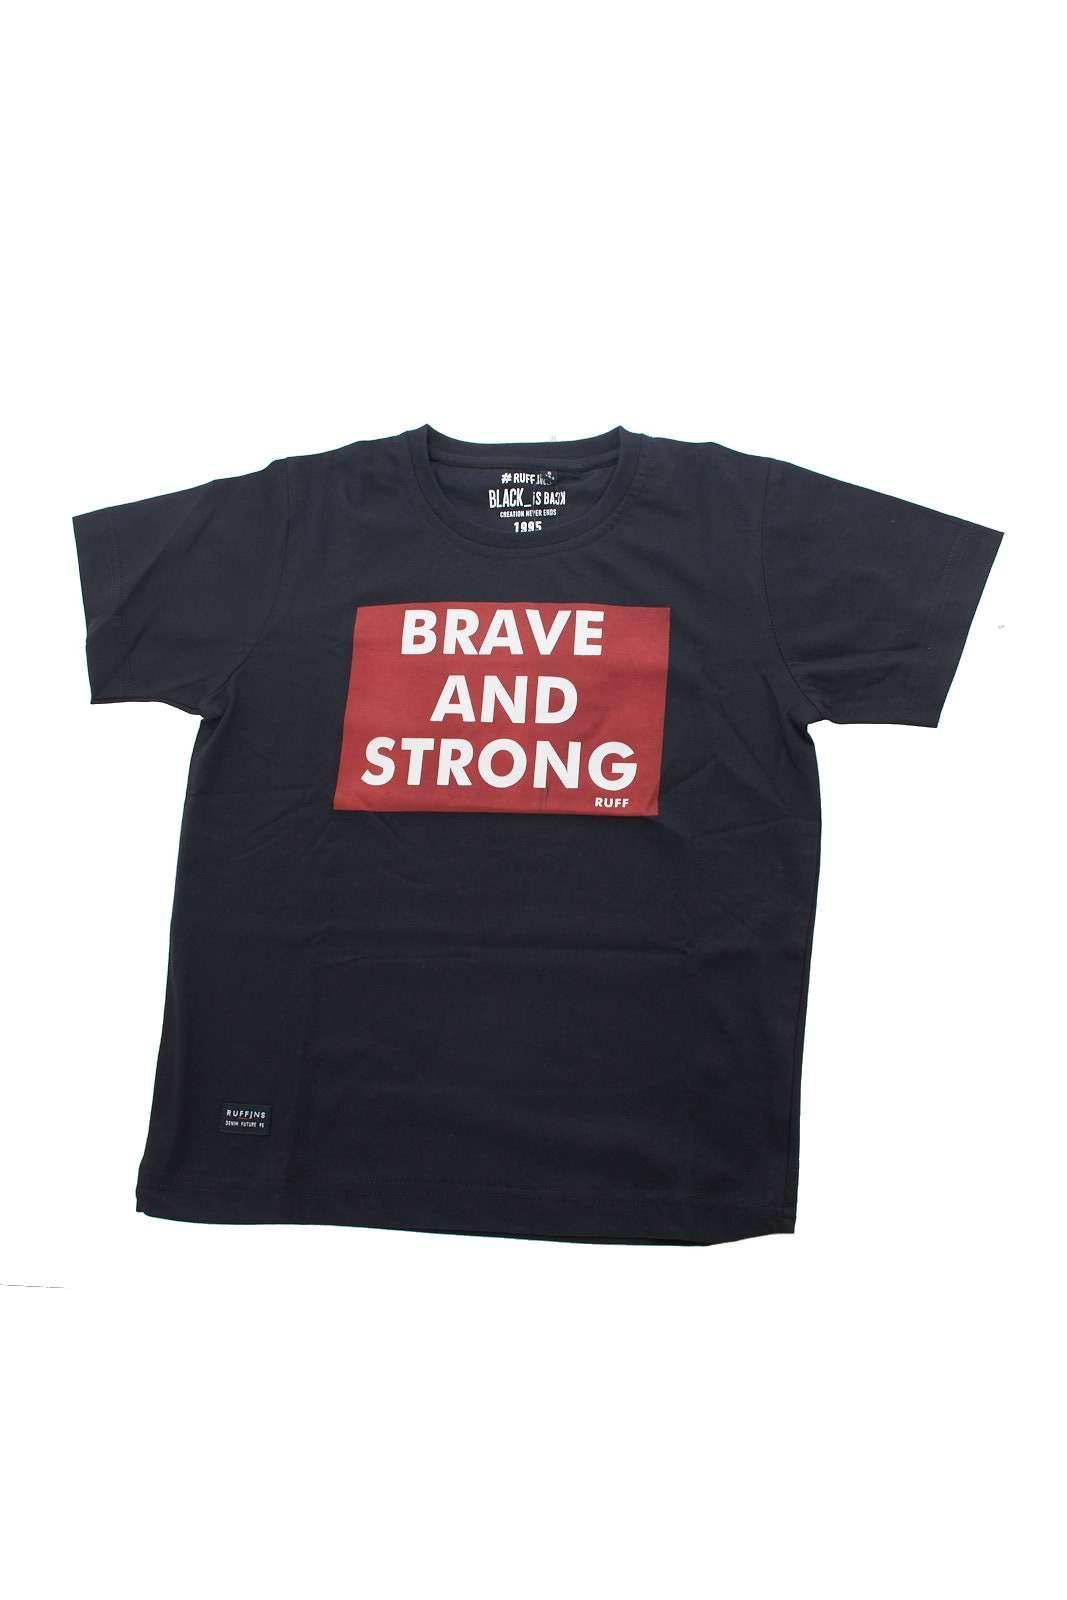 https://www.parmax.com/media/catalog/product/a/i/PE-outlet_parmax-t-shirt-bambino-Ruff-JNS-KK10295G-A.jpg